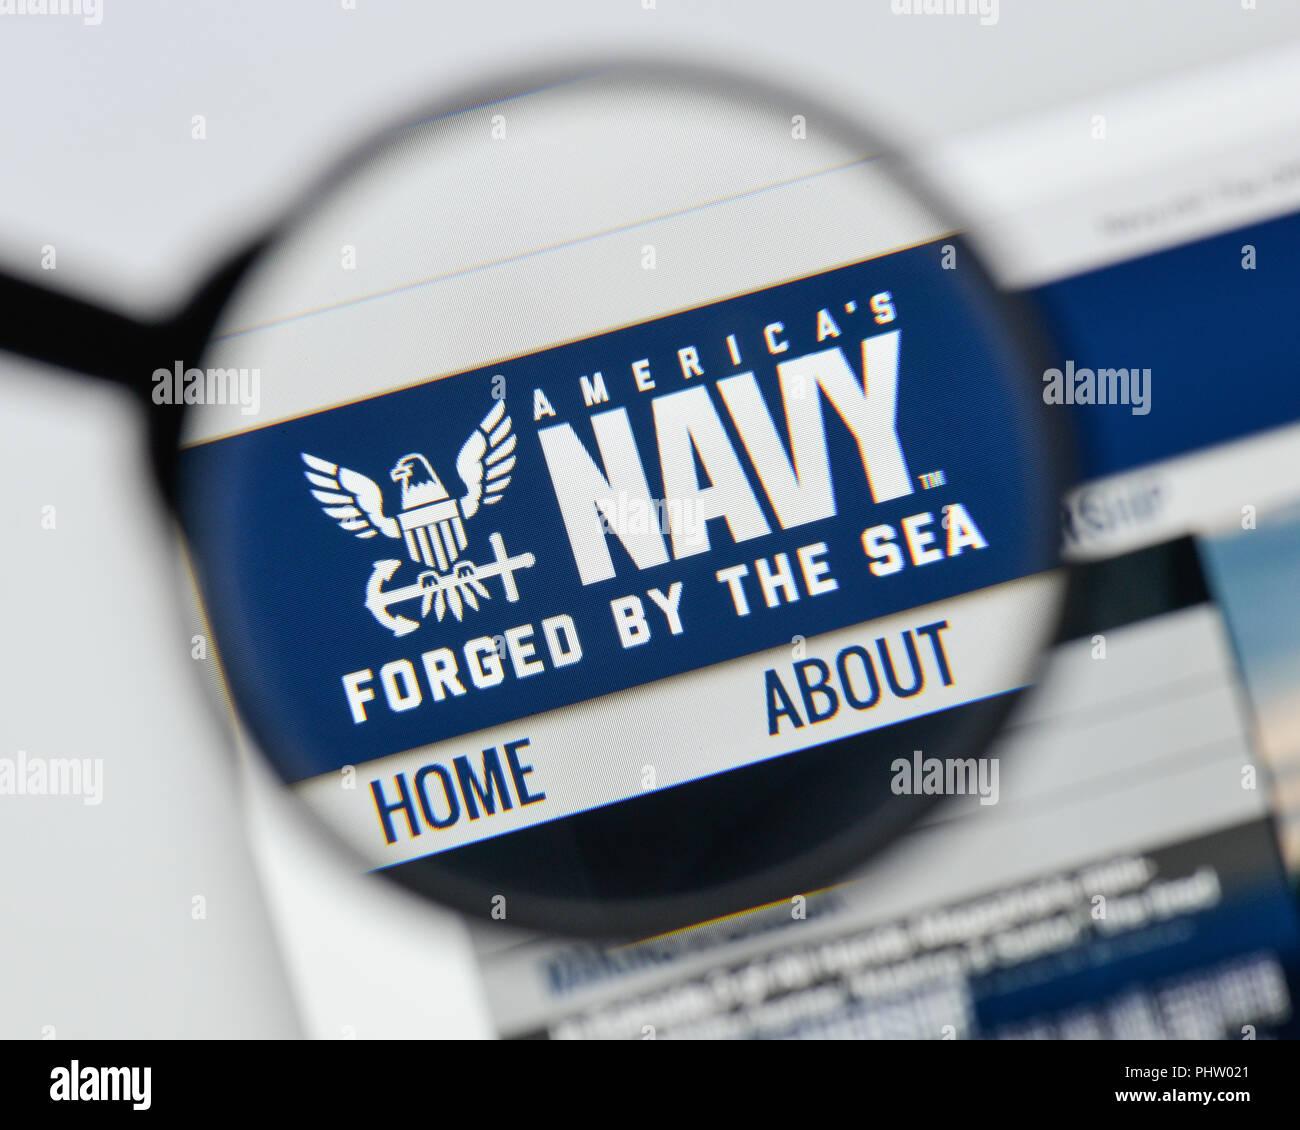 Milan, Italy - August 20, 2018: U.S. Navy website homepage. U.S. Navy logo visible. - Stock Image